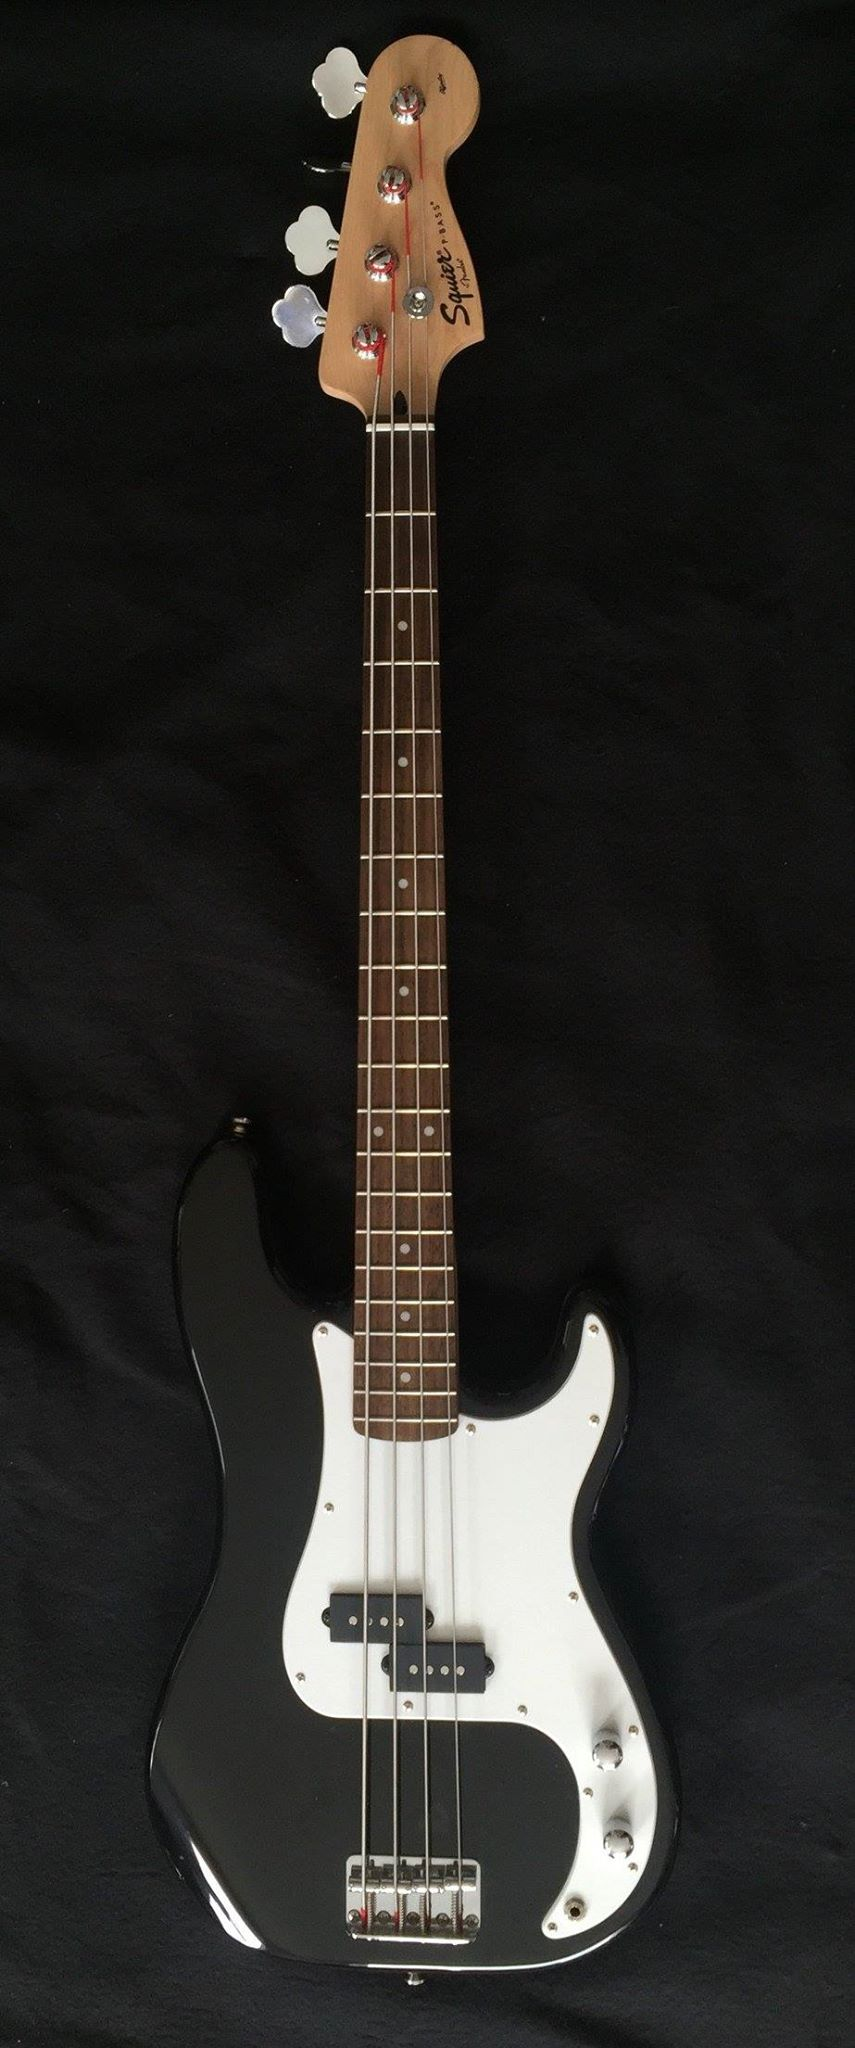 Fender Squier Affinity Precision